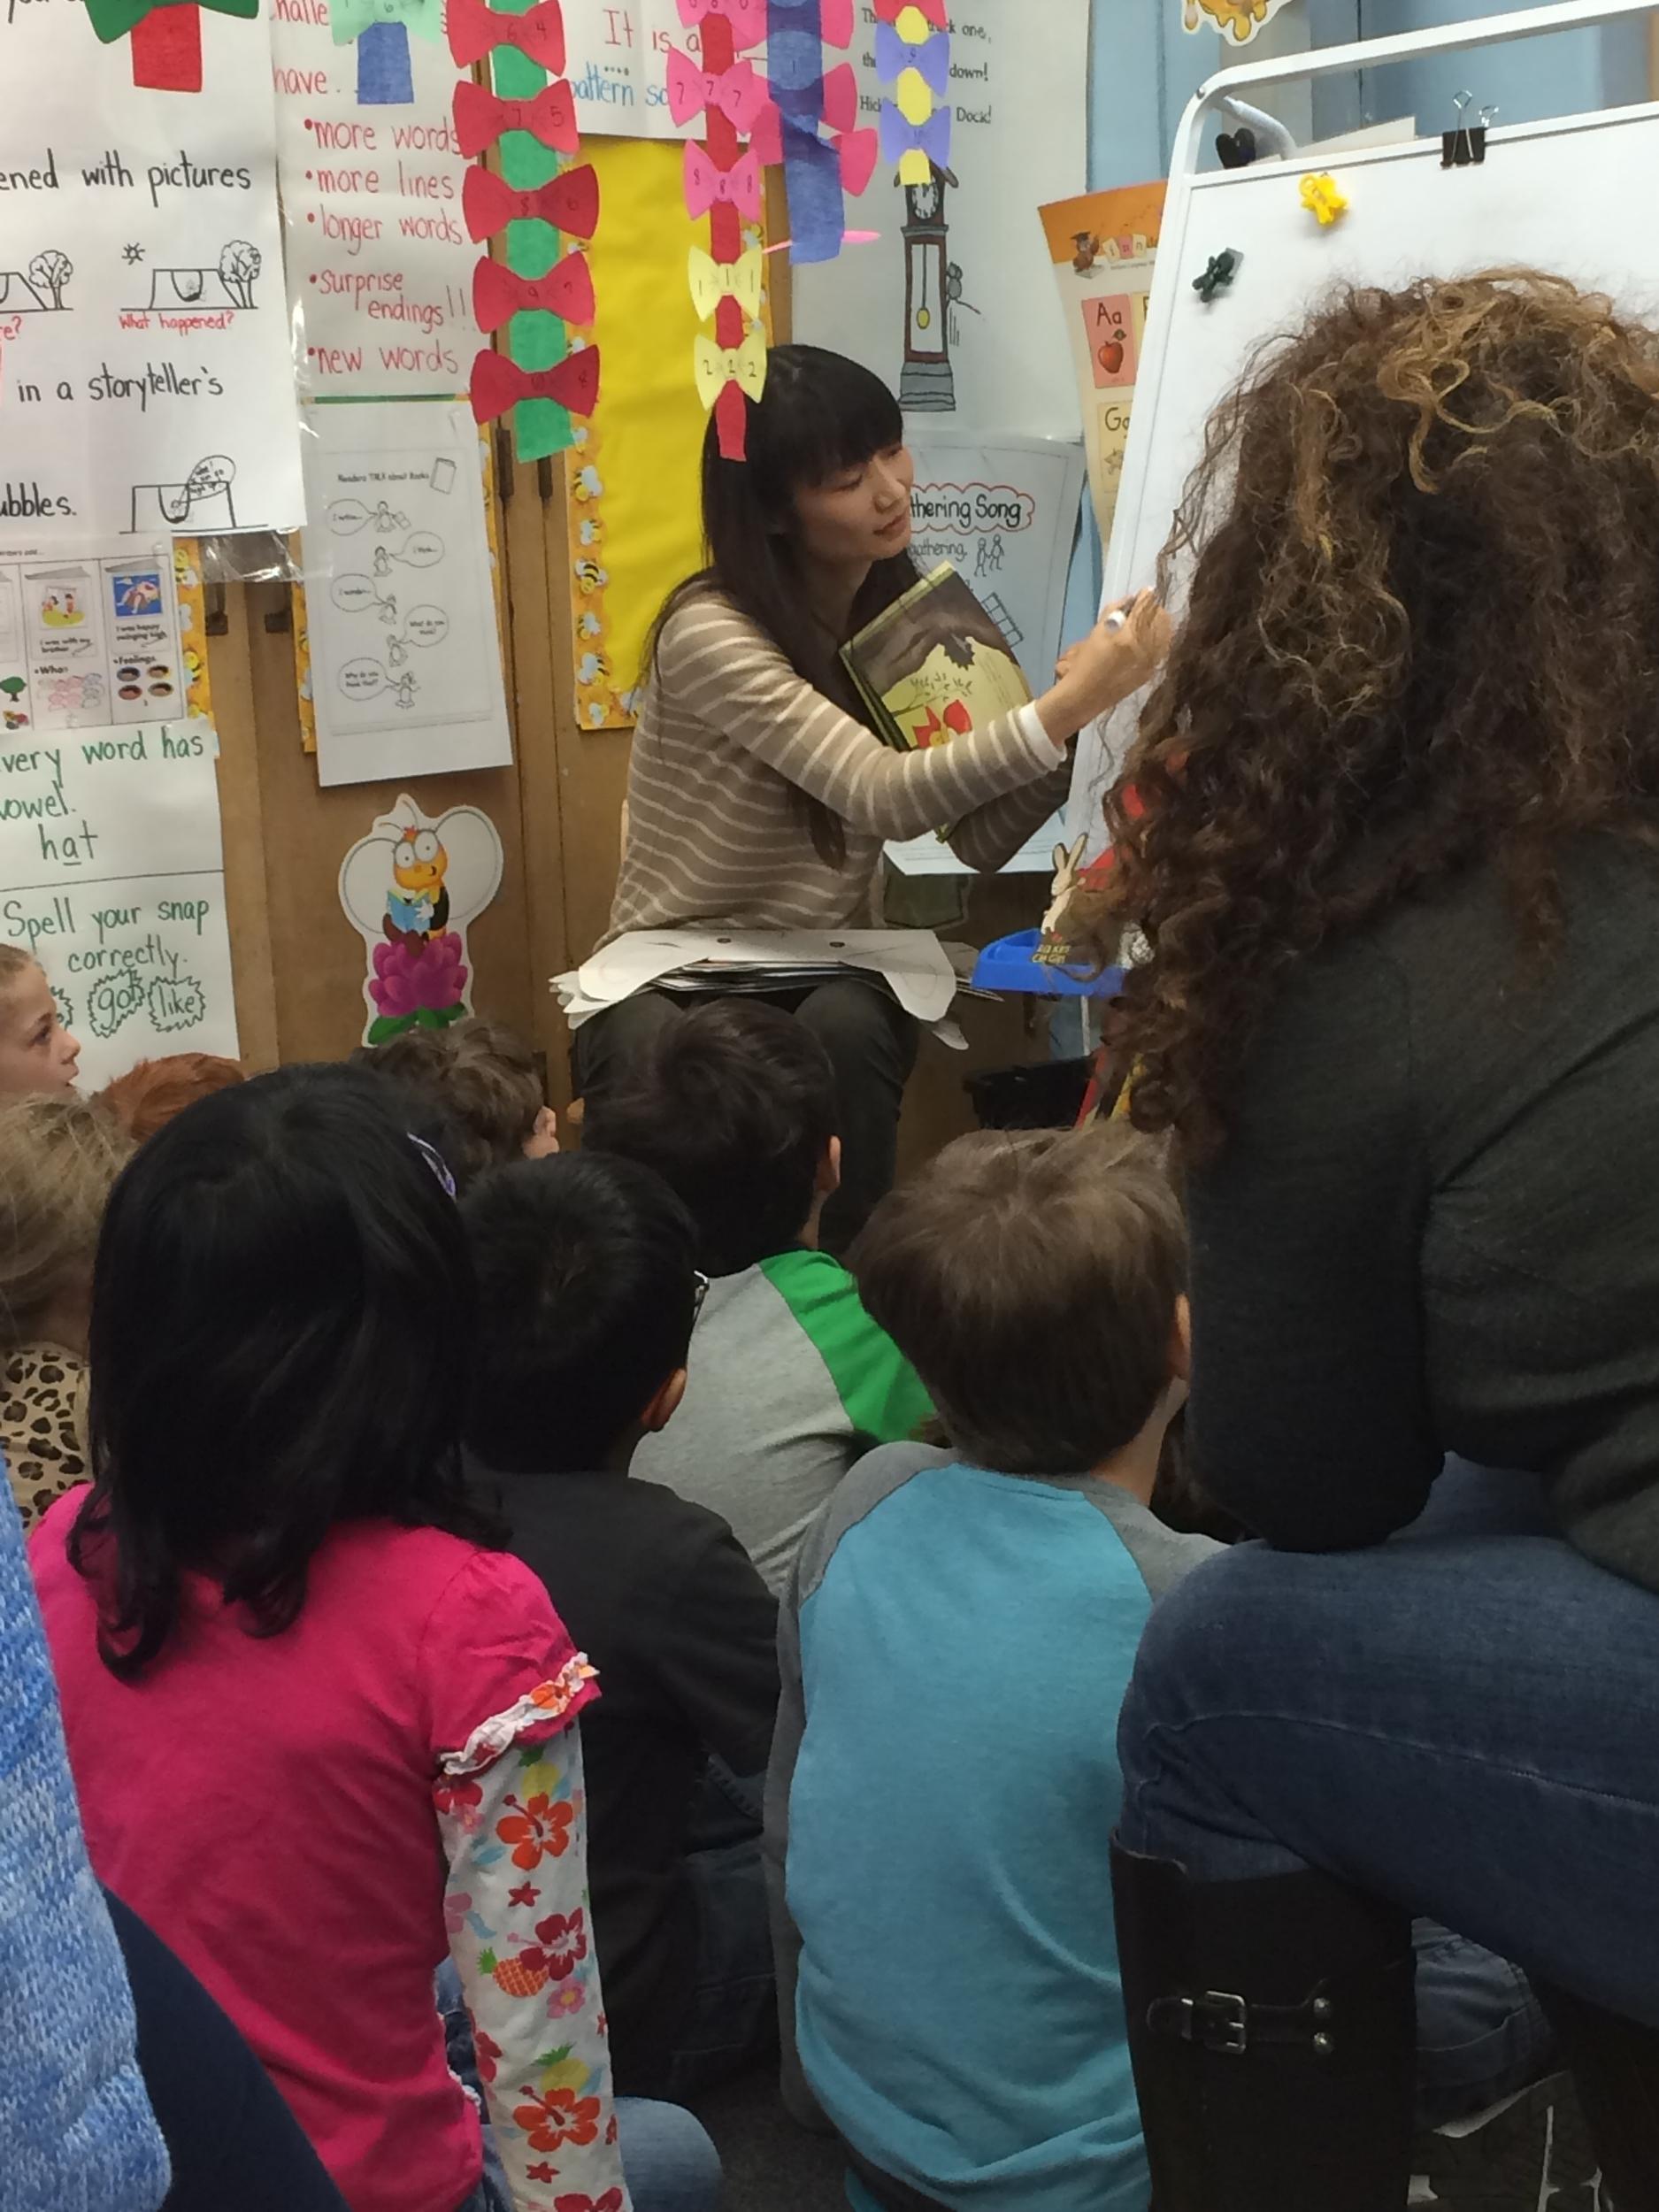 Naoko Stoop demonstrates her illustration technique to a class of kindergarten students.